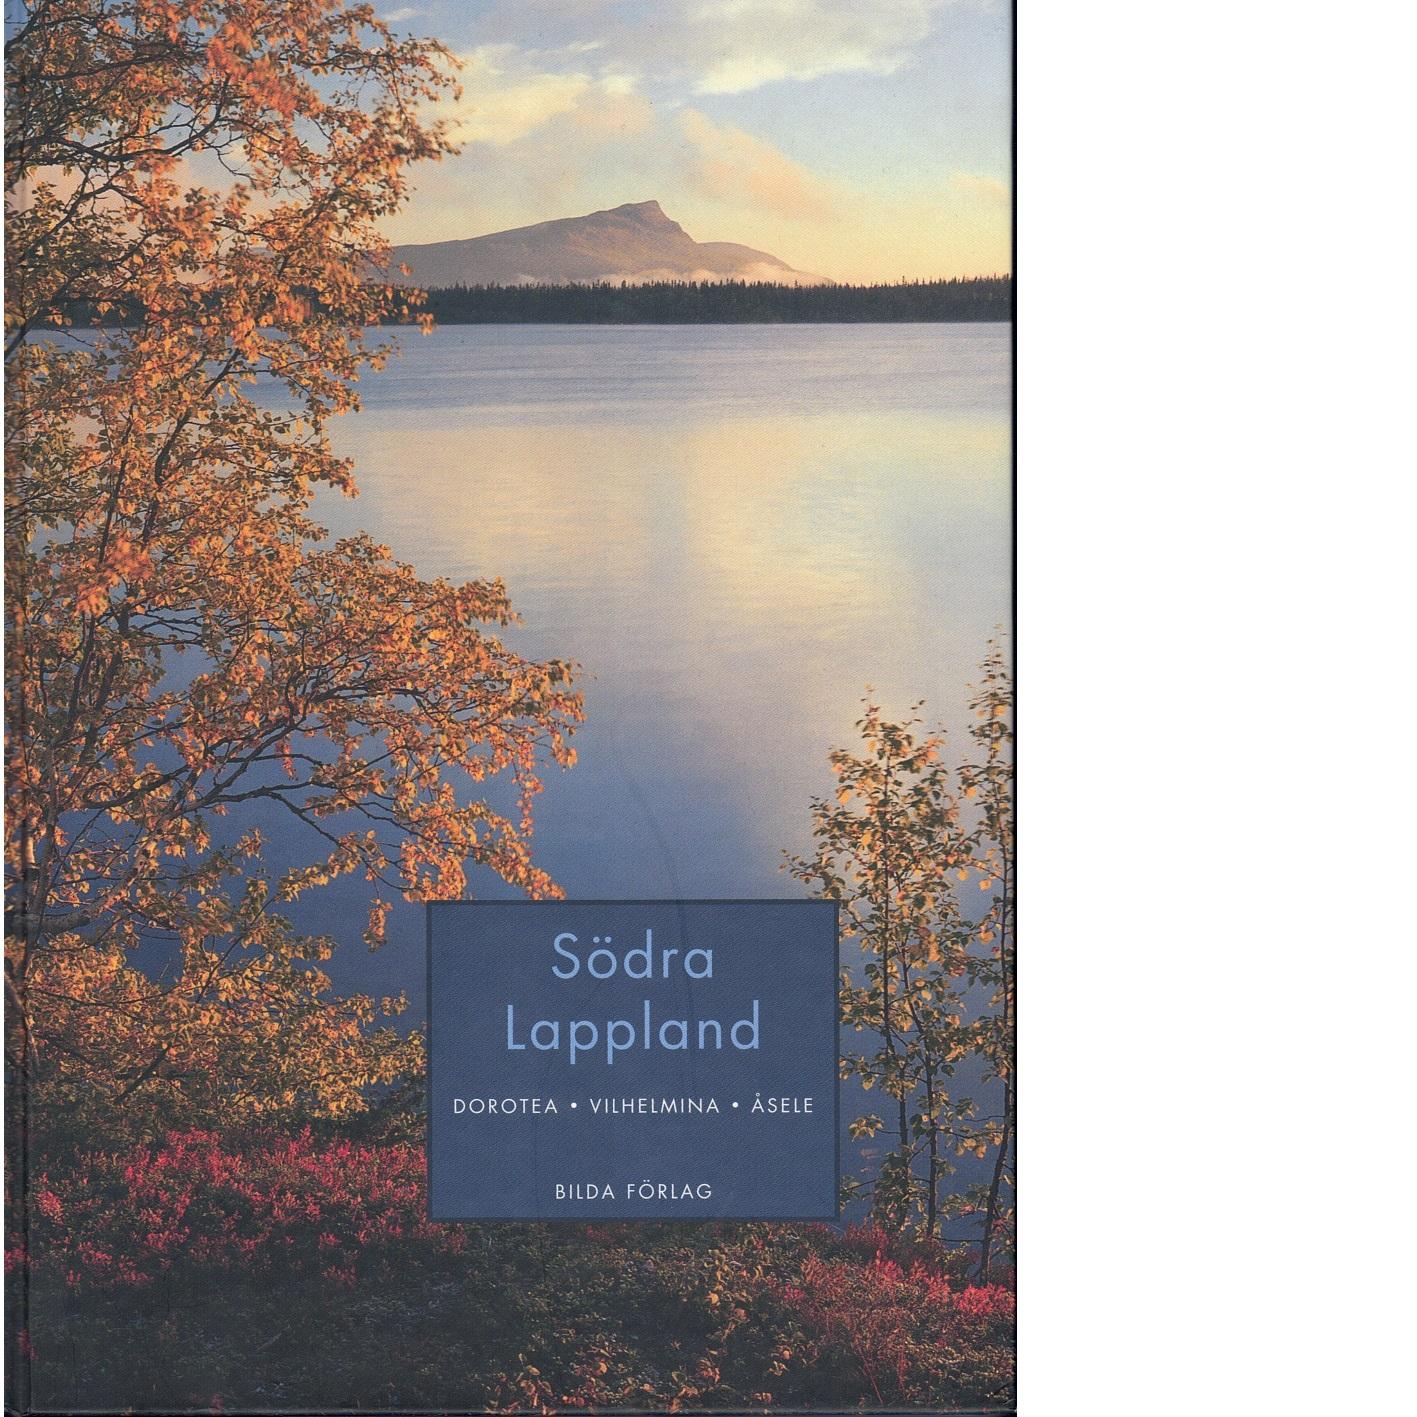 Södra Lappland : [Dorotea, Vilhelmina, Åsele] - Berg, Krister